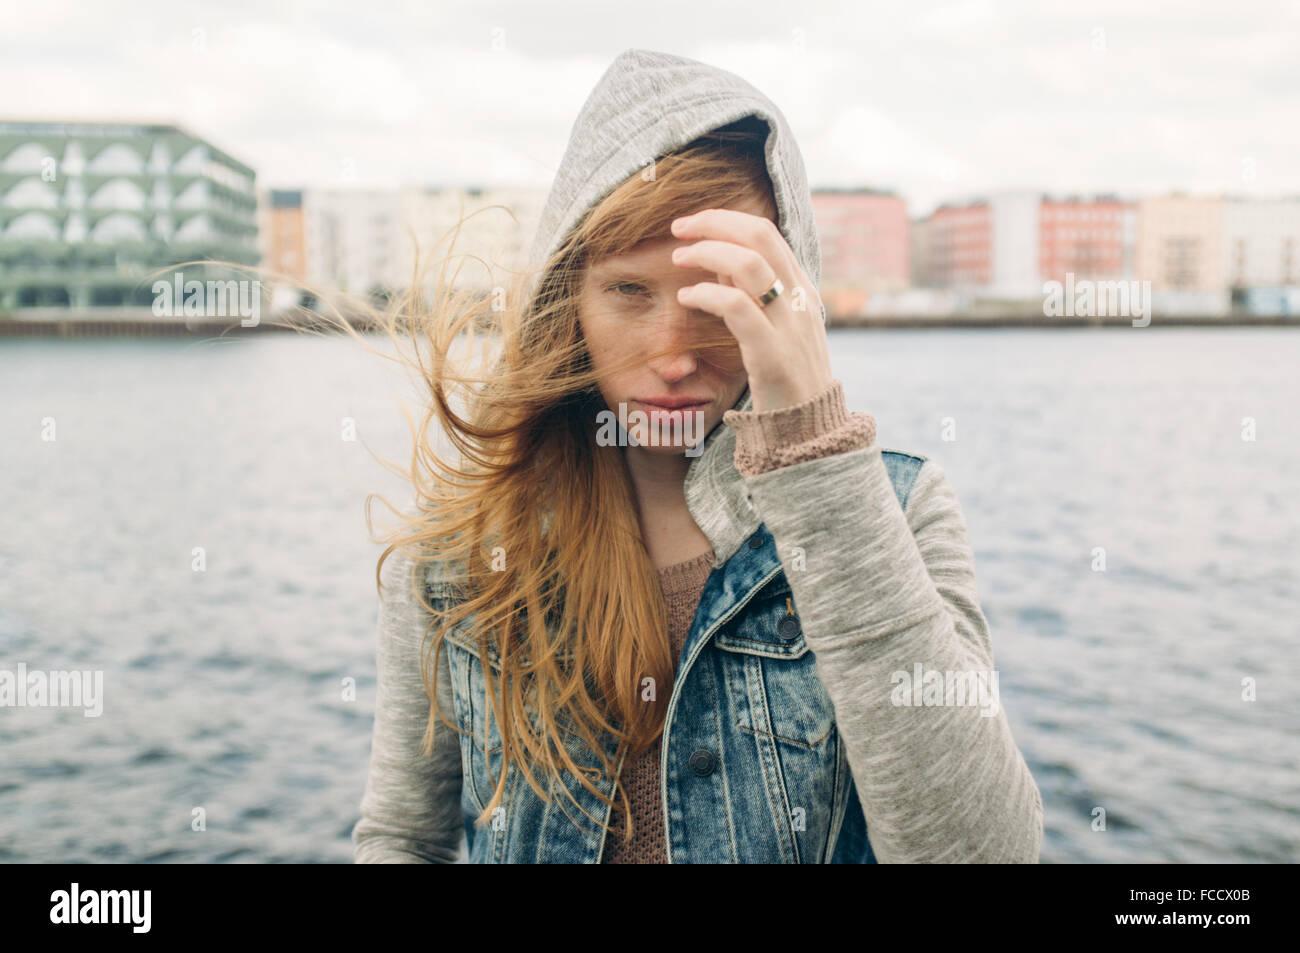 Joven Mujer de pelo rojo Turismo Imagen De Stock